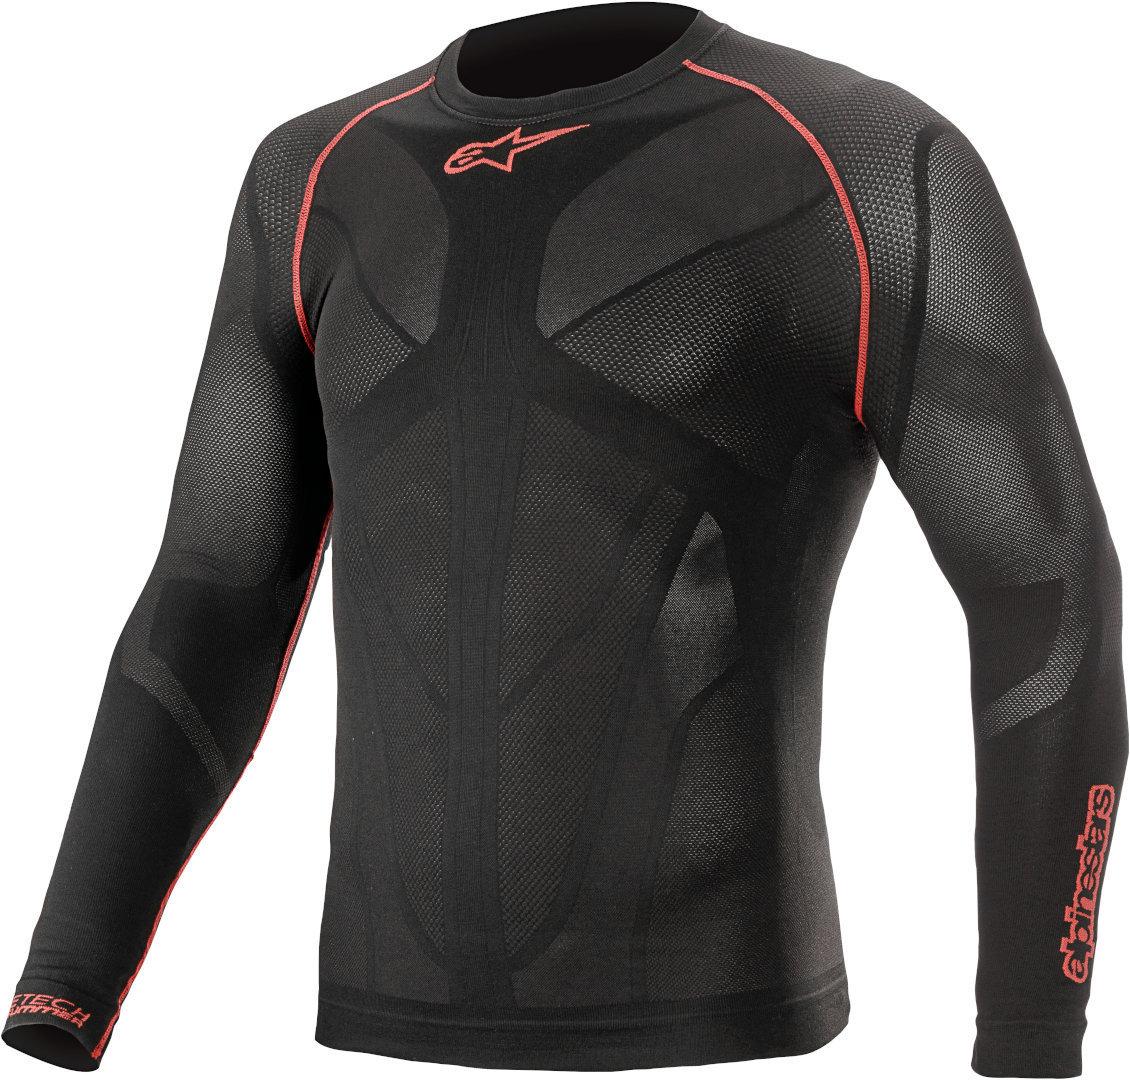 Alpinestars Ride Tech V2 Langarm Funktionsshirt, schwarz-rot, Größe XL 2XL, schwarz-rot, Größe XL 2XL